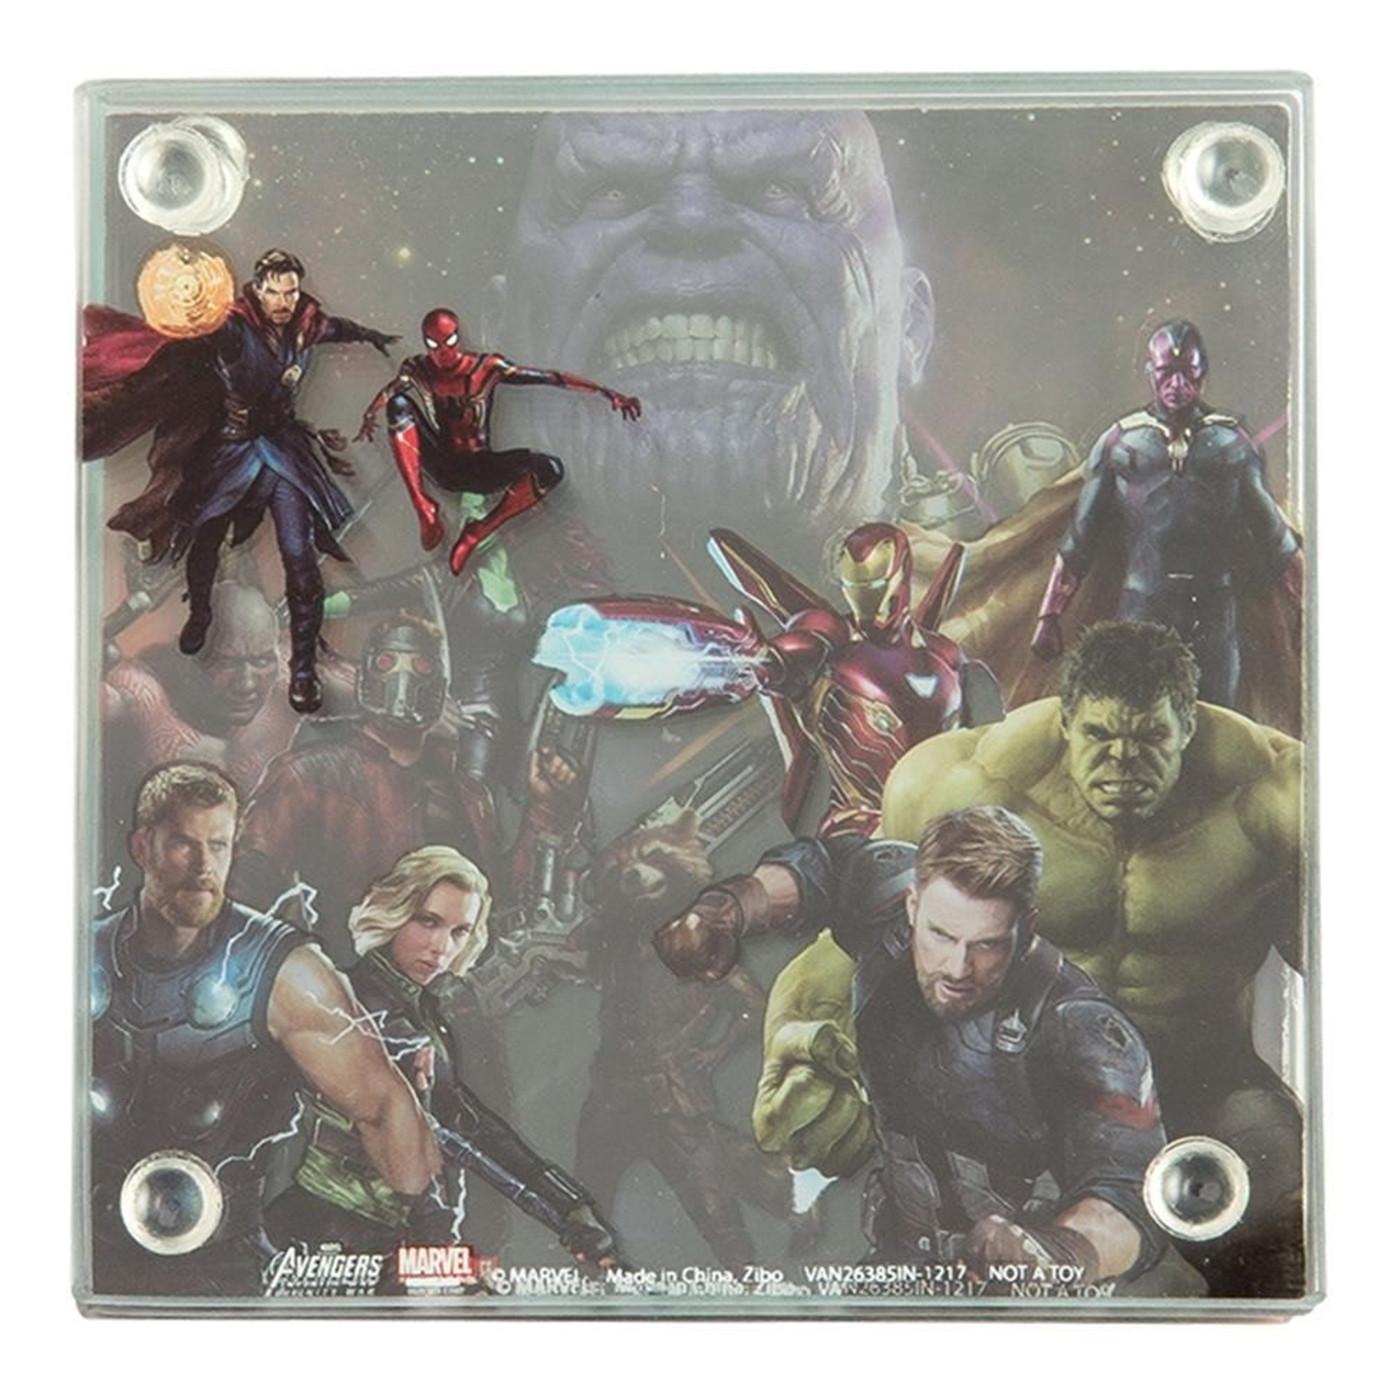 Avengers Infinity War Coaster Set of 4